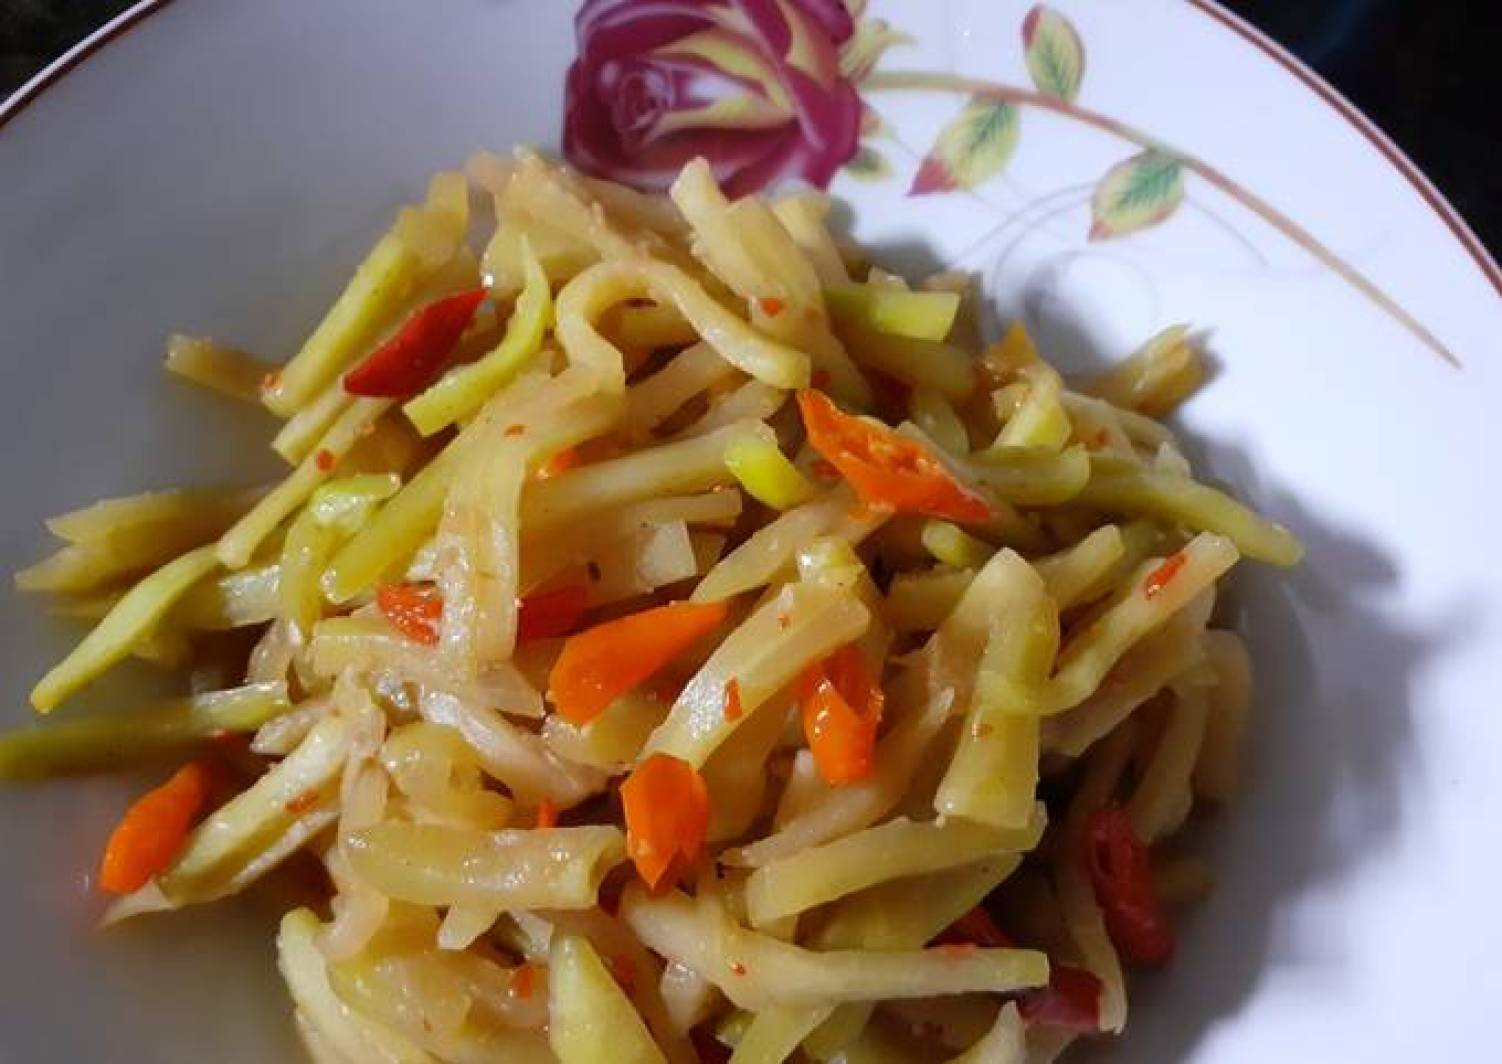 Cara Mudah Tumis Labu Siam Pedas Manis Yummy Resep Mudah Sederhana